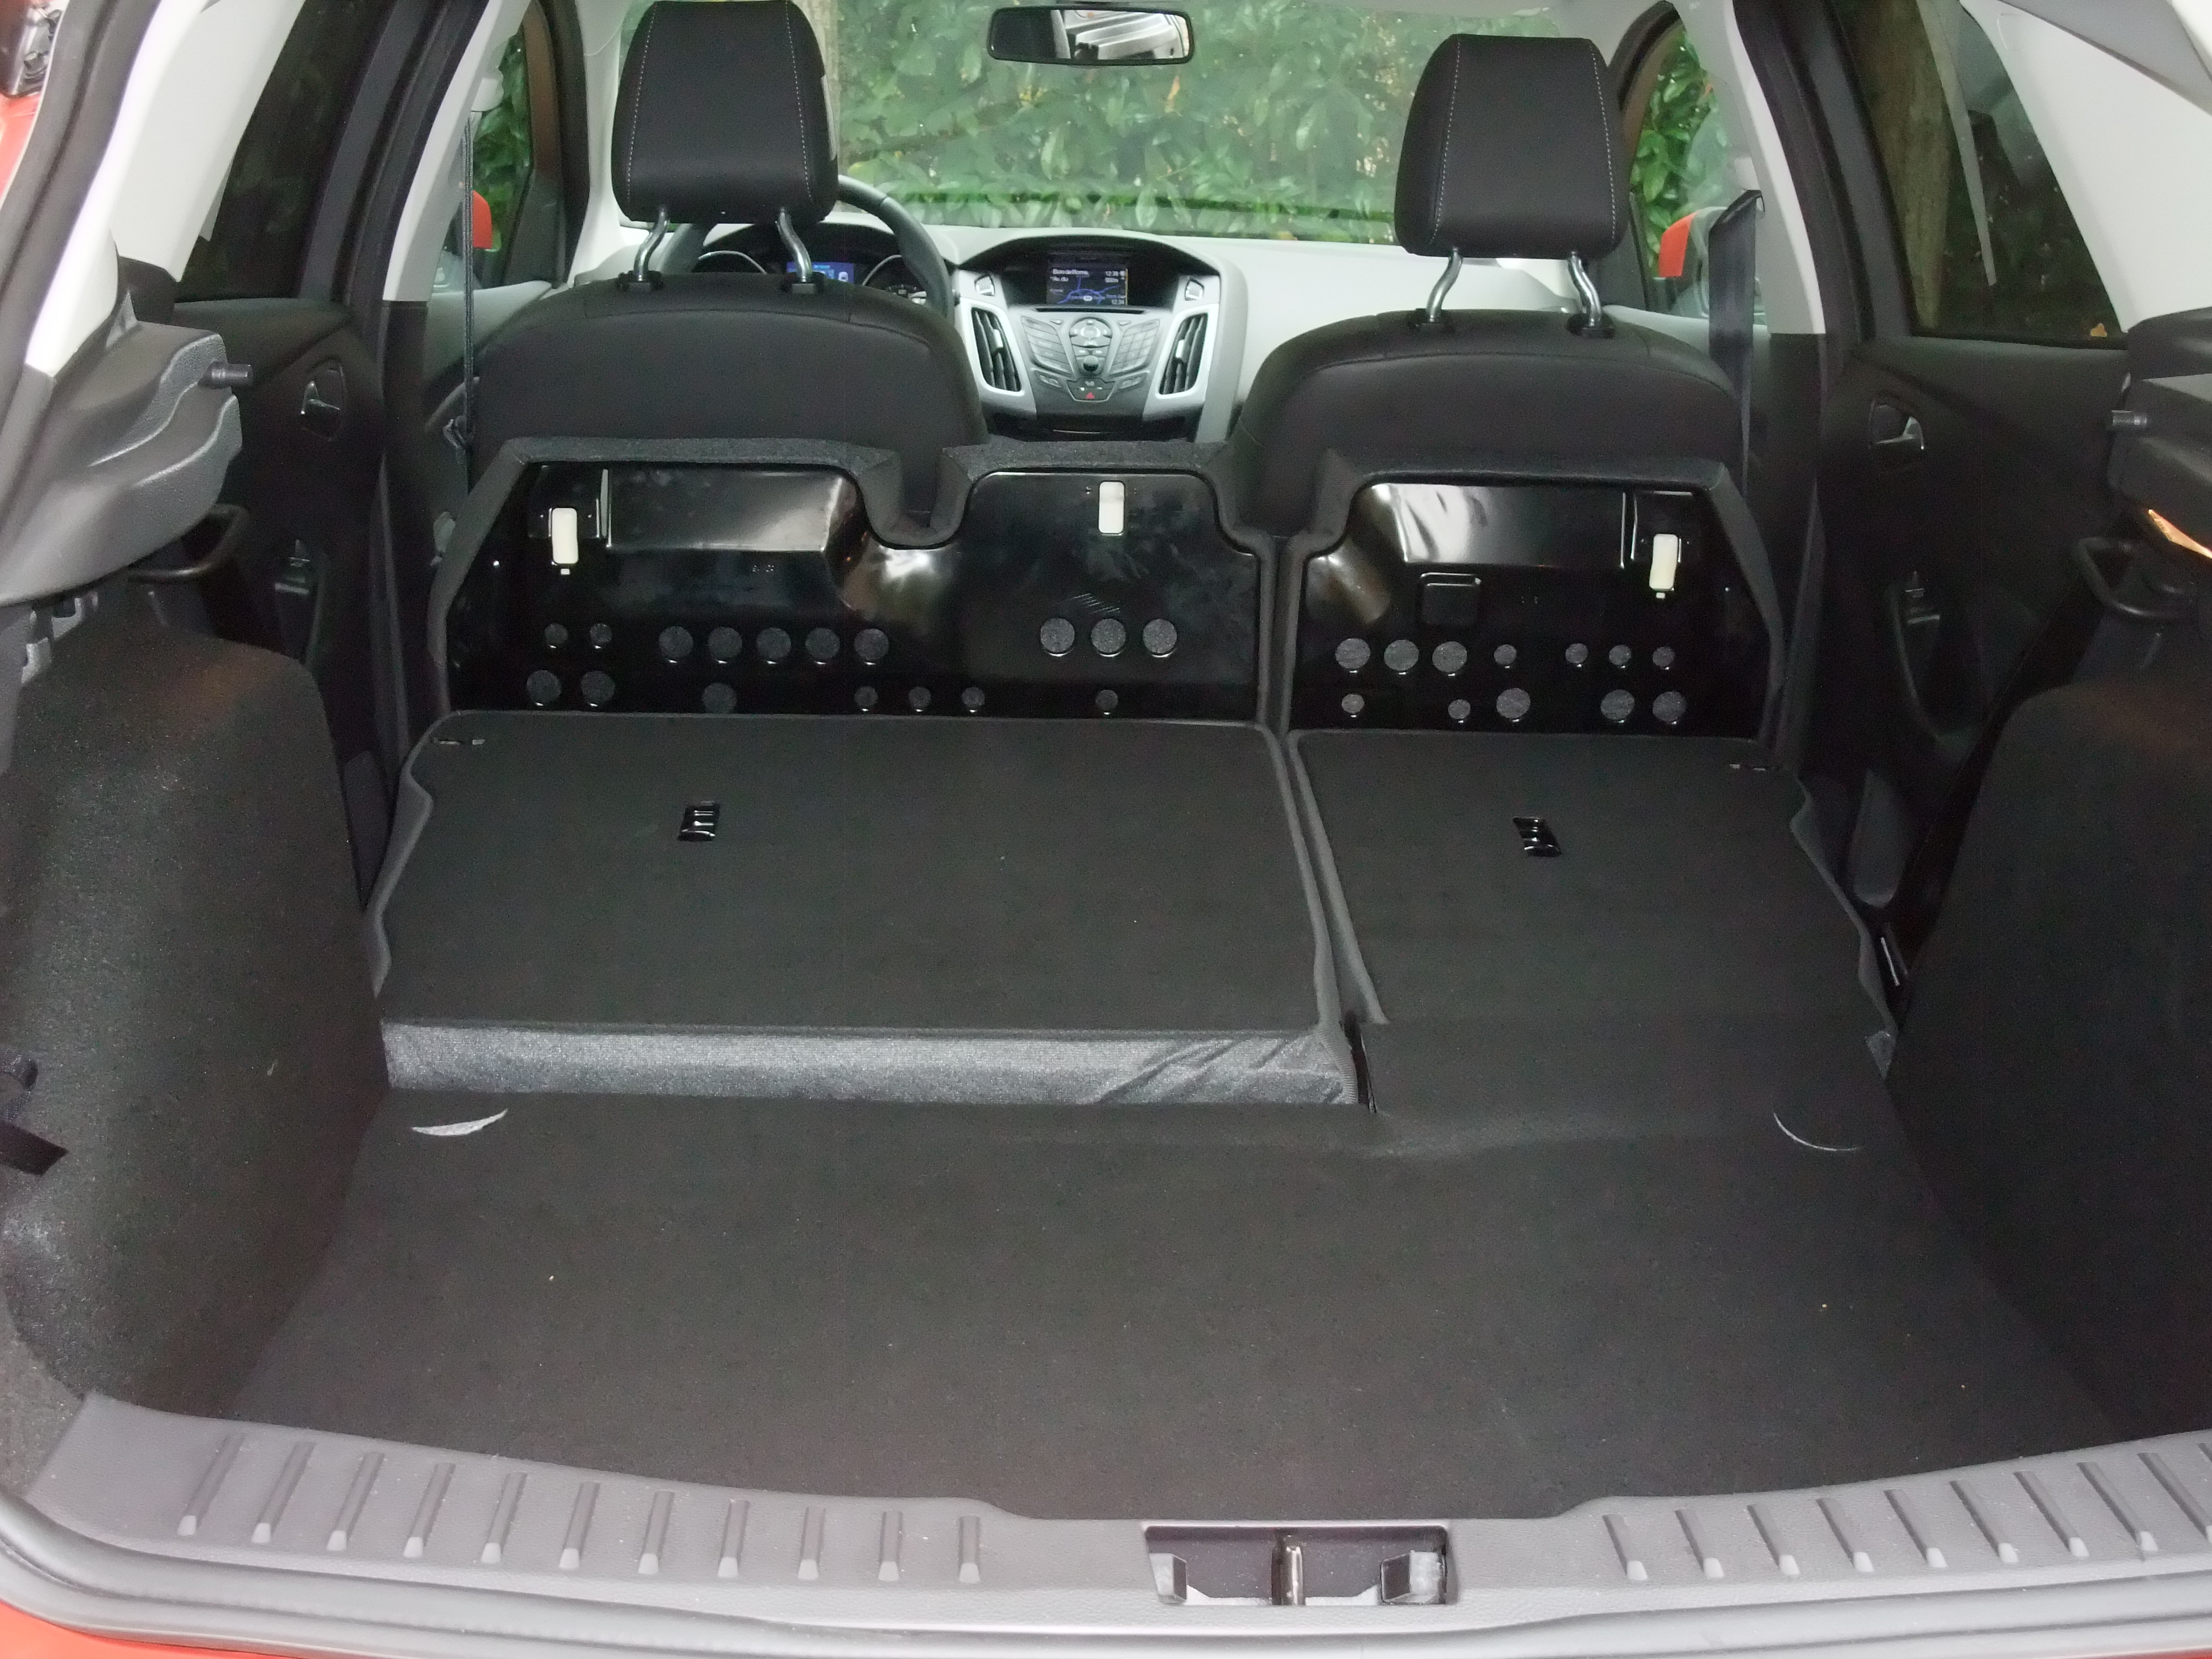 essai ford focus 1 6 tdci 115 ch 109 g bv6 titanium 2011. Black Bedroom Furniture Sets. Home Design Ideas